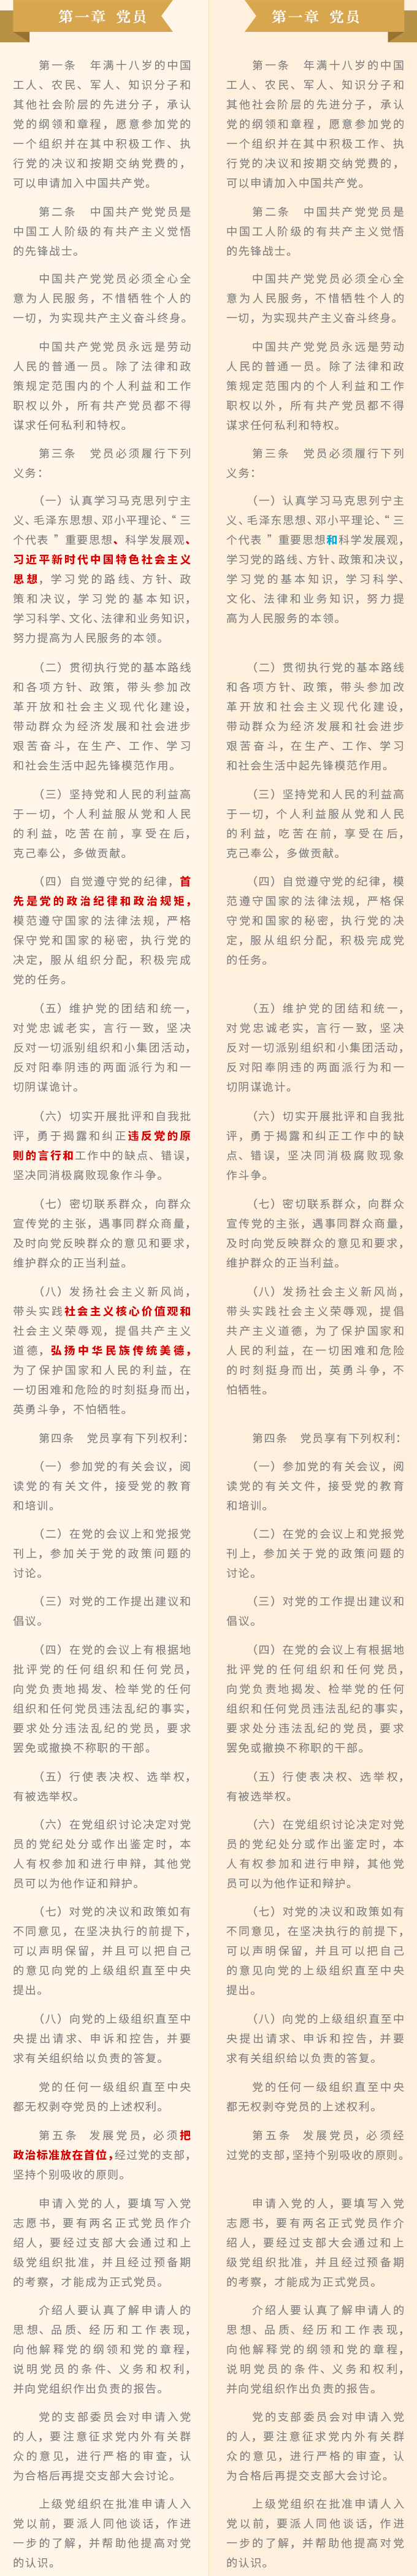 http://www.ccdi.gov.cn/yw/201710/W020171031664657829016.png